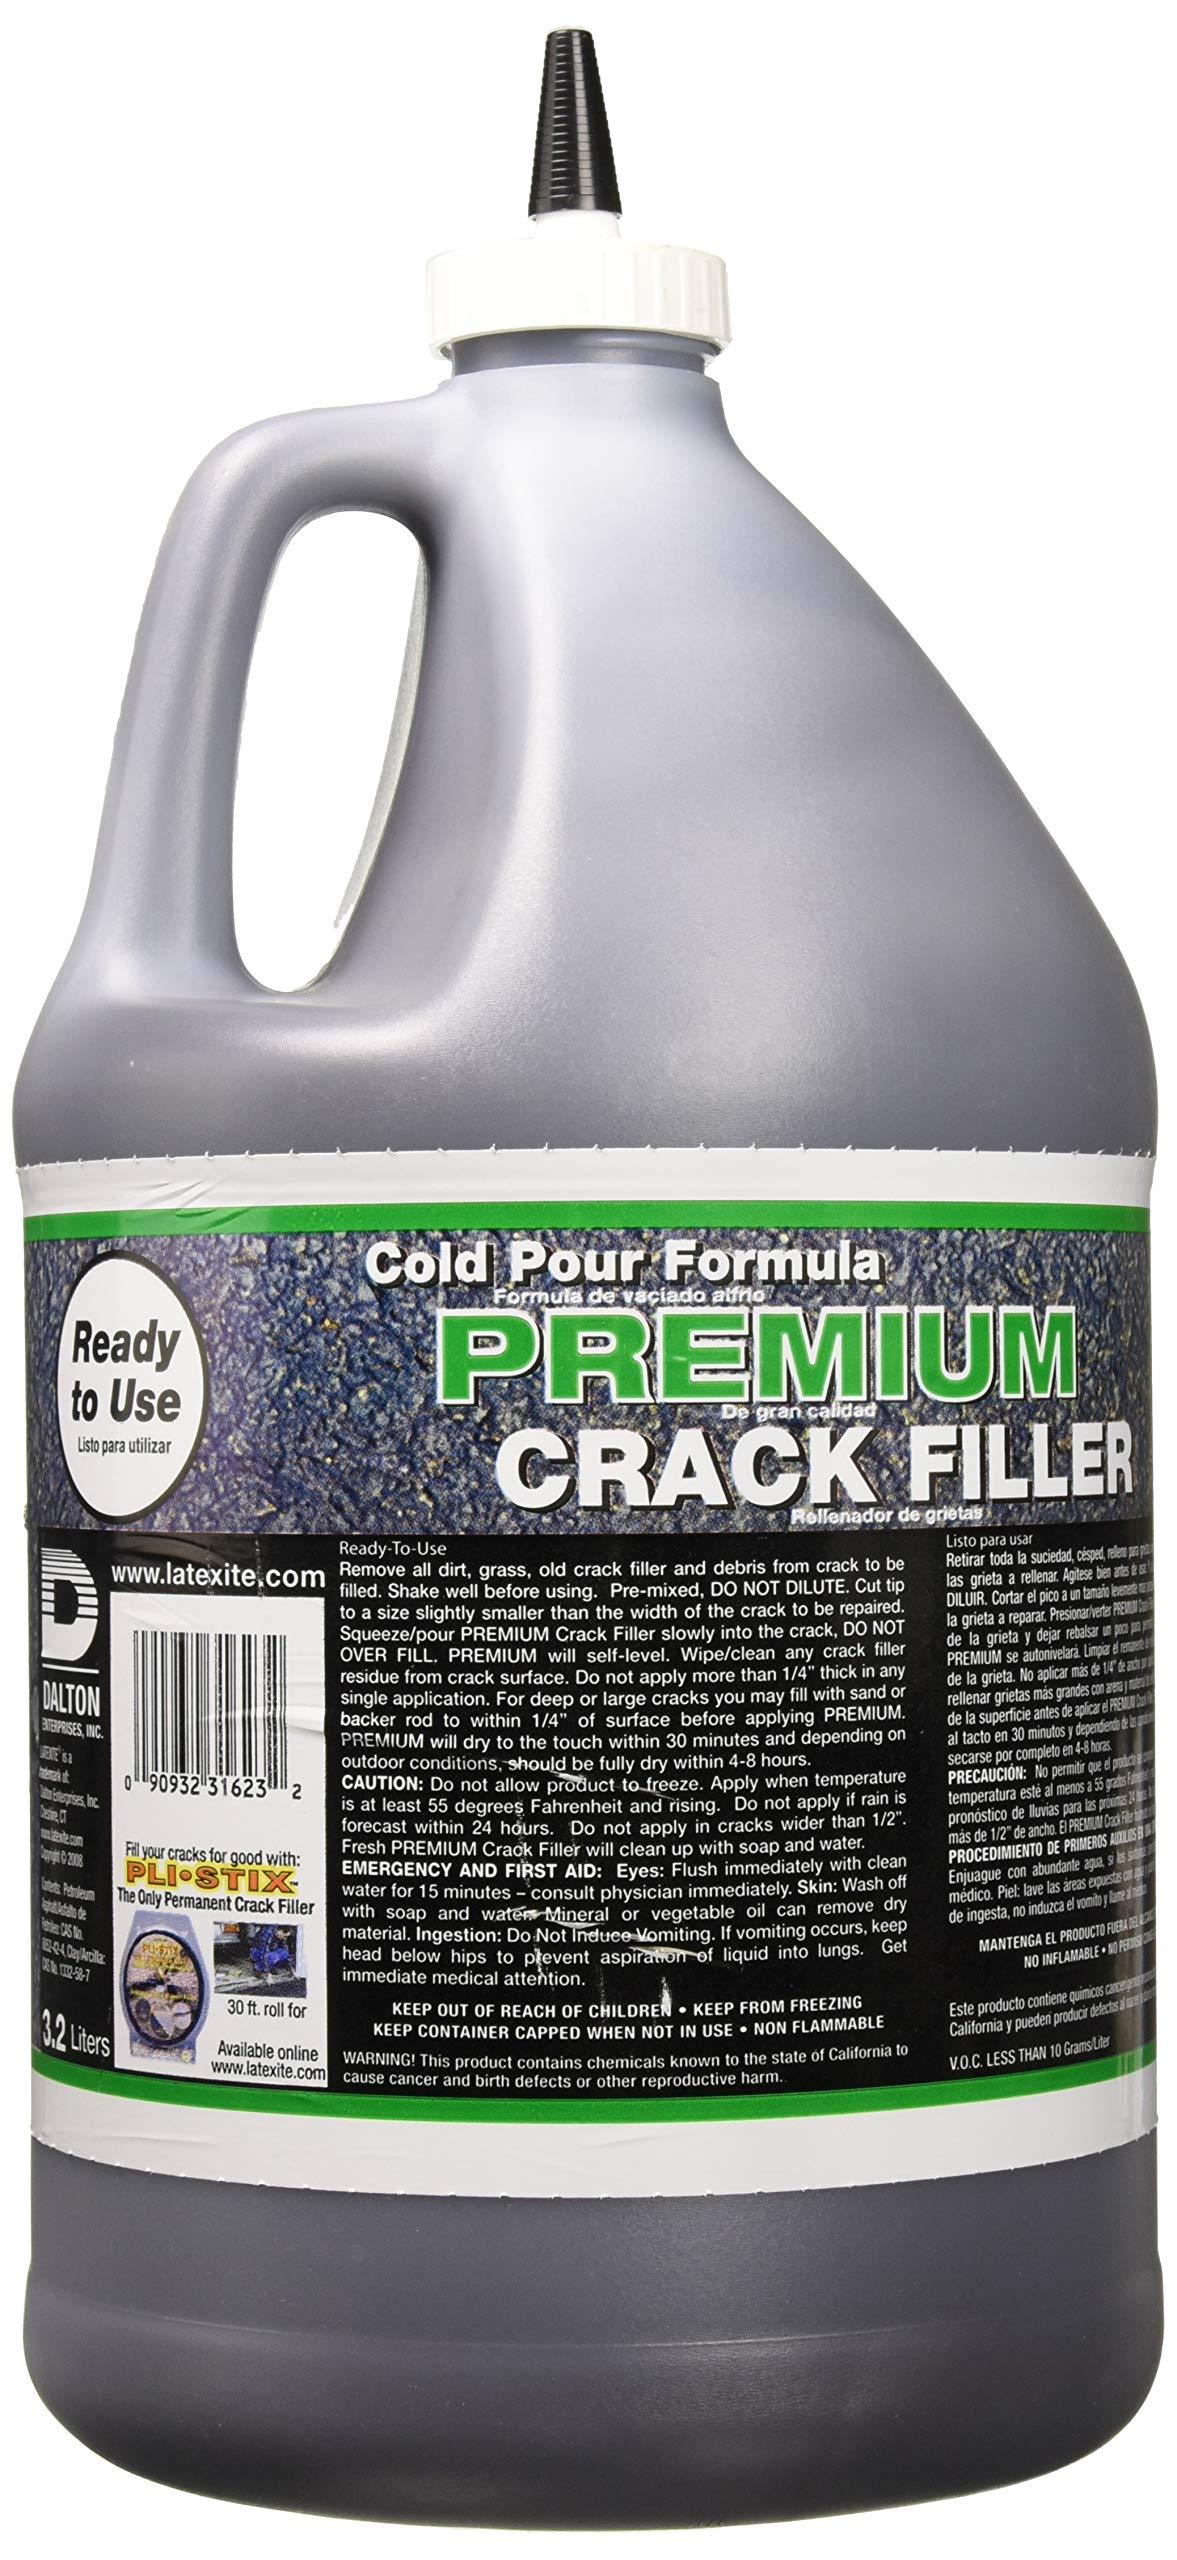 DALTON ENTERPRISES 31623 Latex-Ite Premium Crack Filler, 1 Gal by Dalton Enterprises (Image #2)